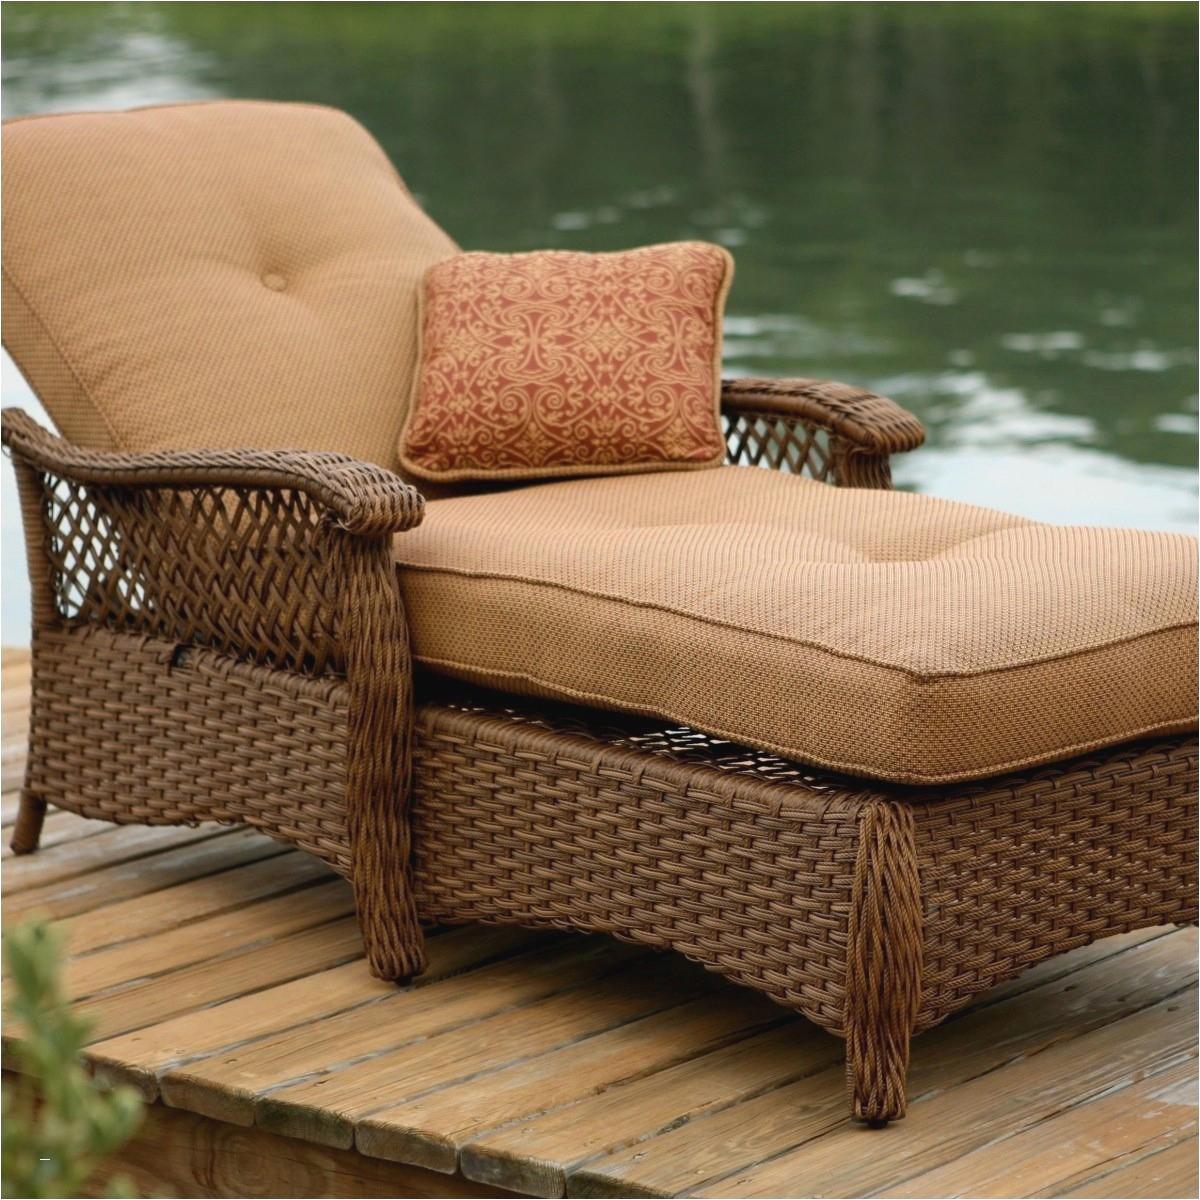 patio furniture cushions walmart nice wicker outdoor sofa 0d patio design ideas walmart outdoor patio